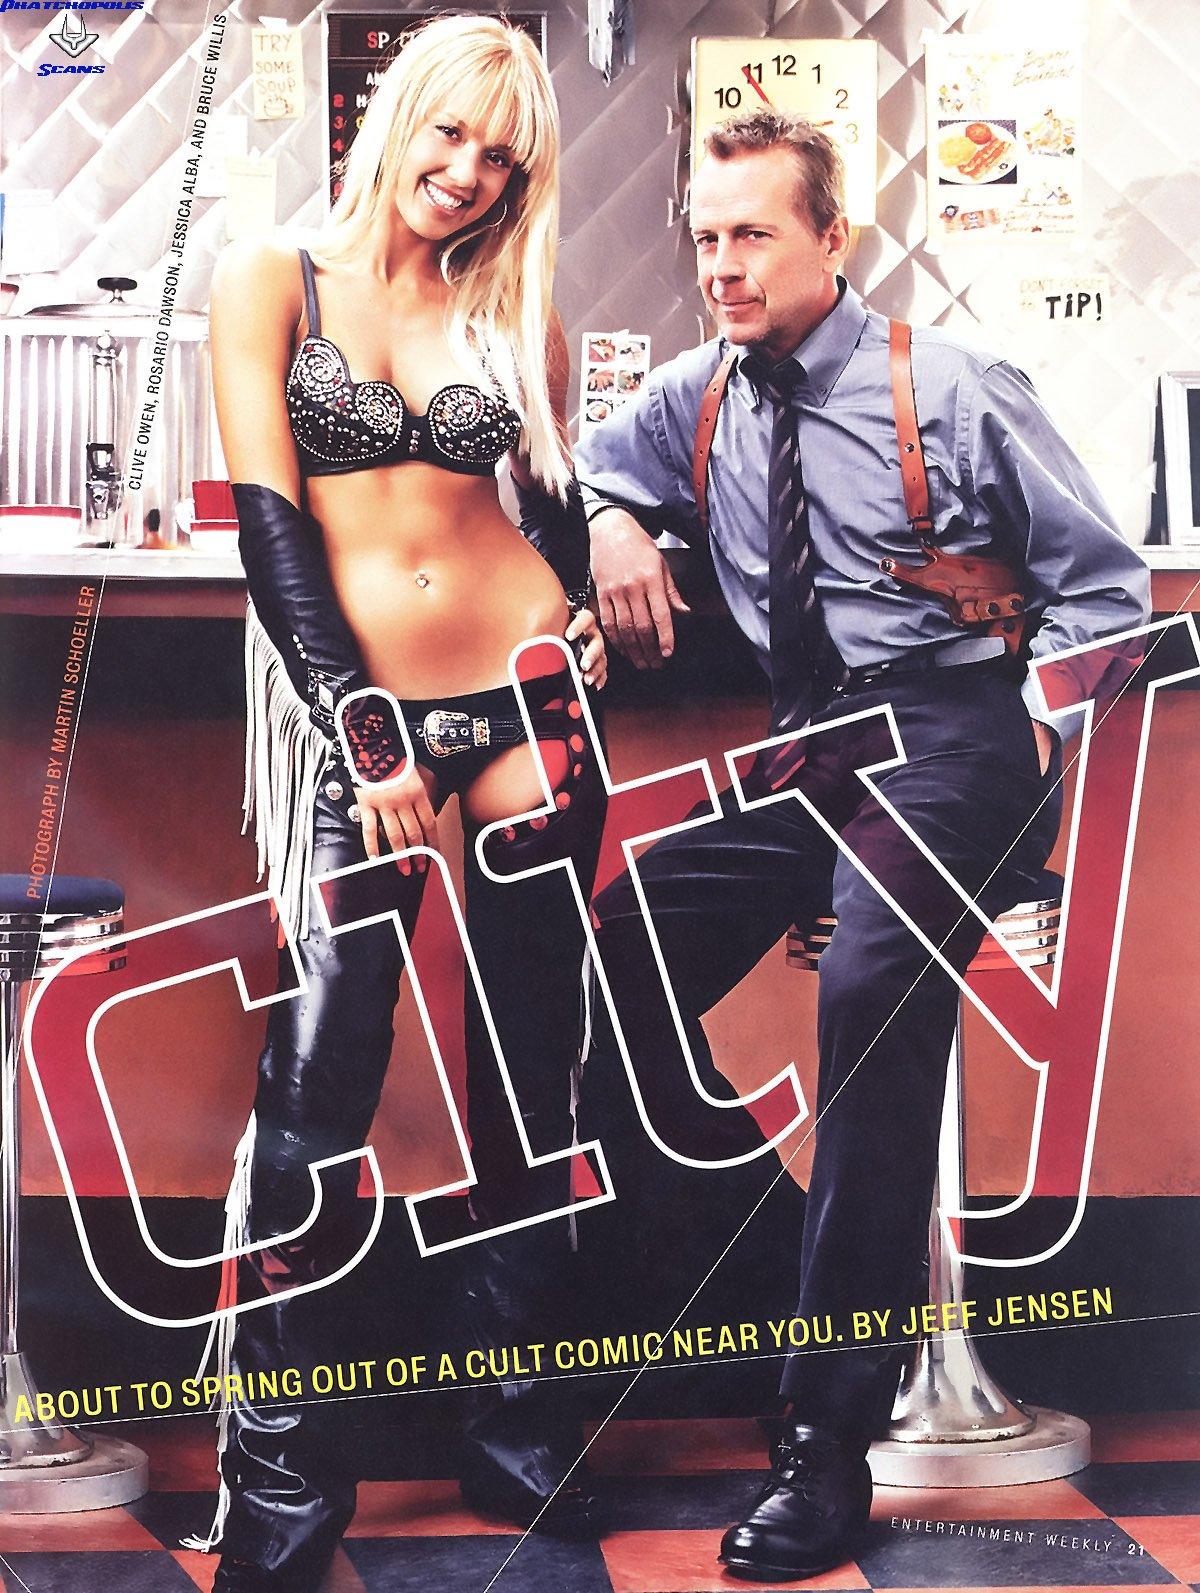 http://1.bp.blogspot.com/-zdtGtgbOo64/T3mx7xueacI/AAAAAAAAMvA/rBsnOPvRjT4/s1600/Sin+City+(3).jpeg